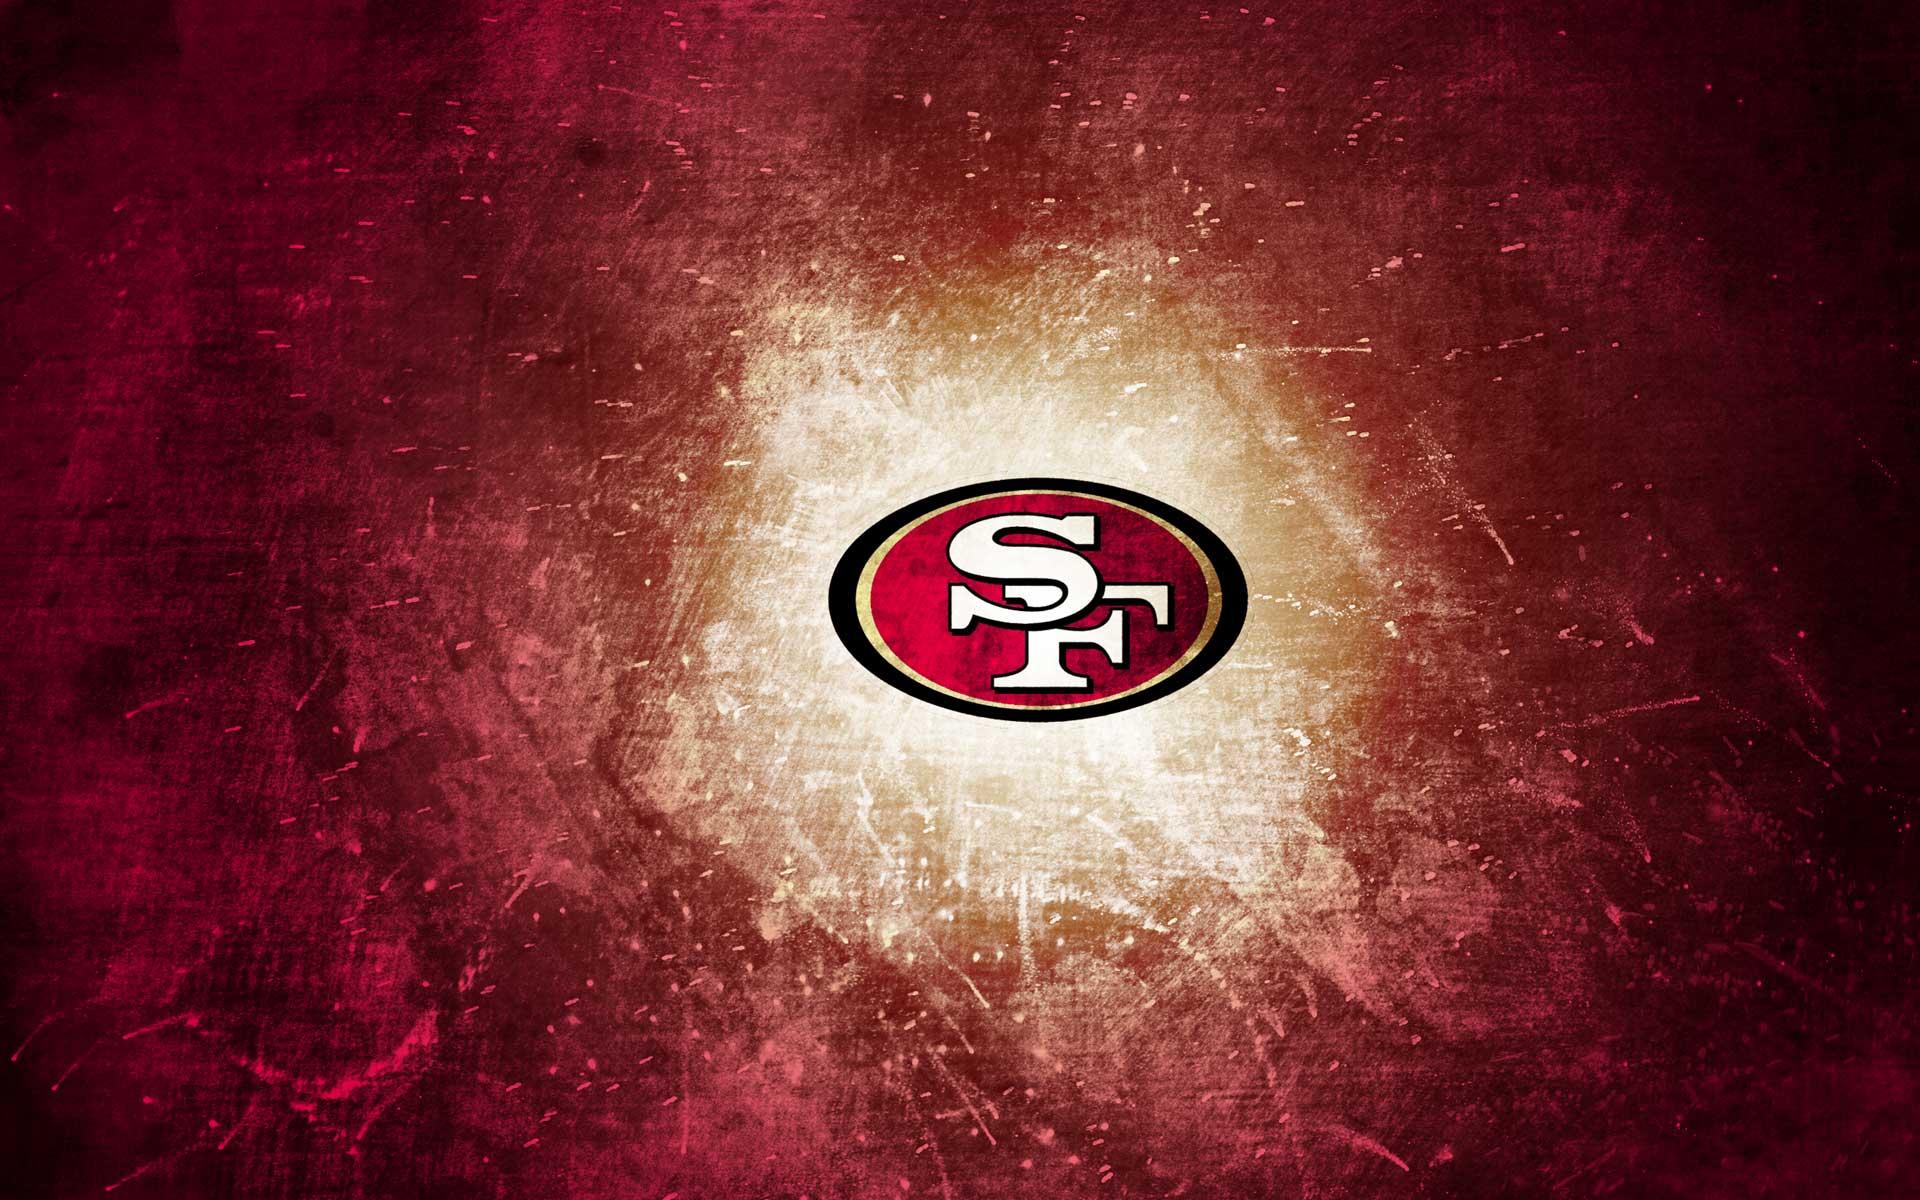 49ers 3d Wallpaper San Francisco 49ers Logo Hd Wallpapers Pixelstalk Net